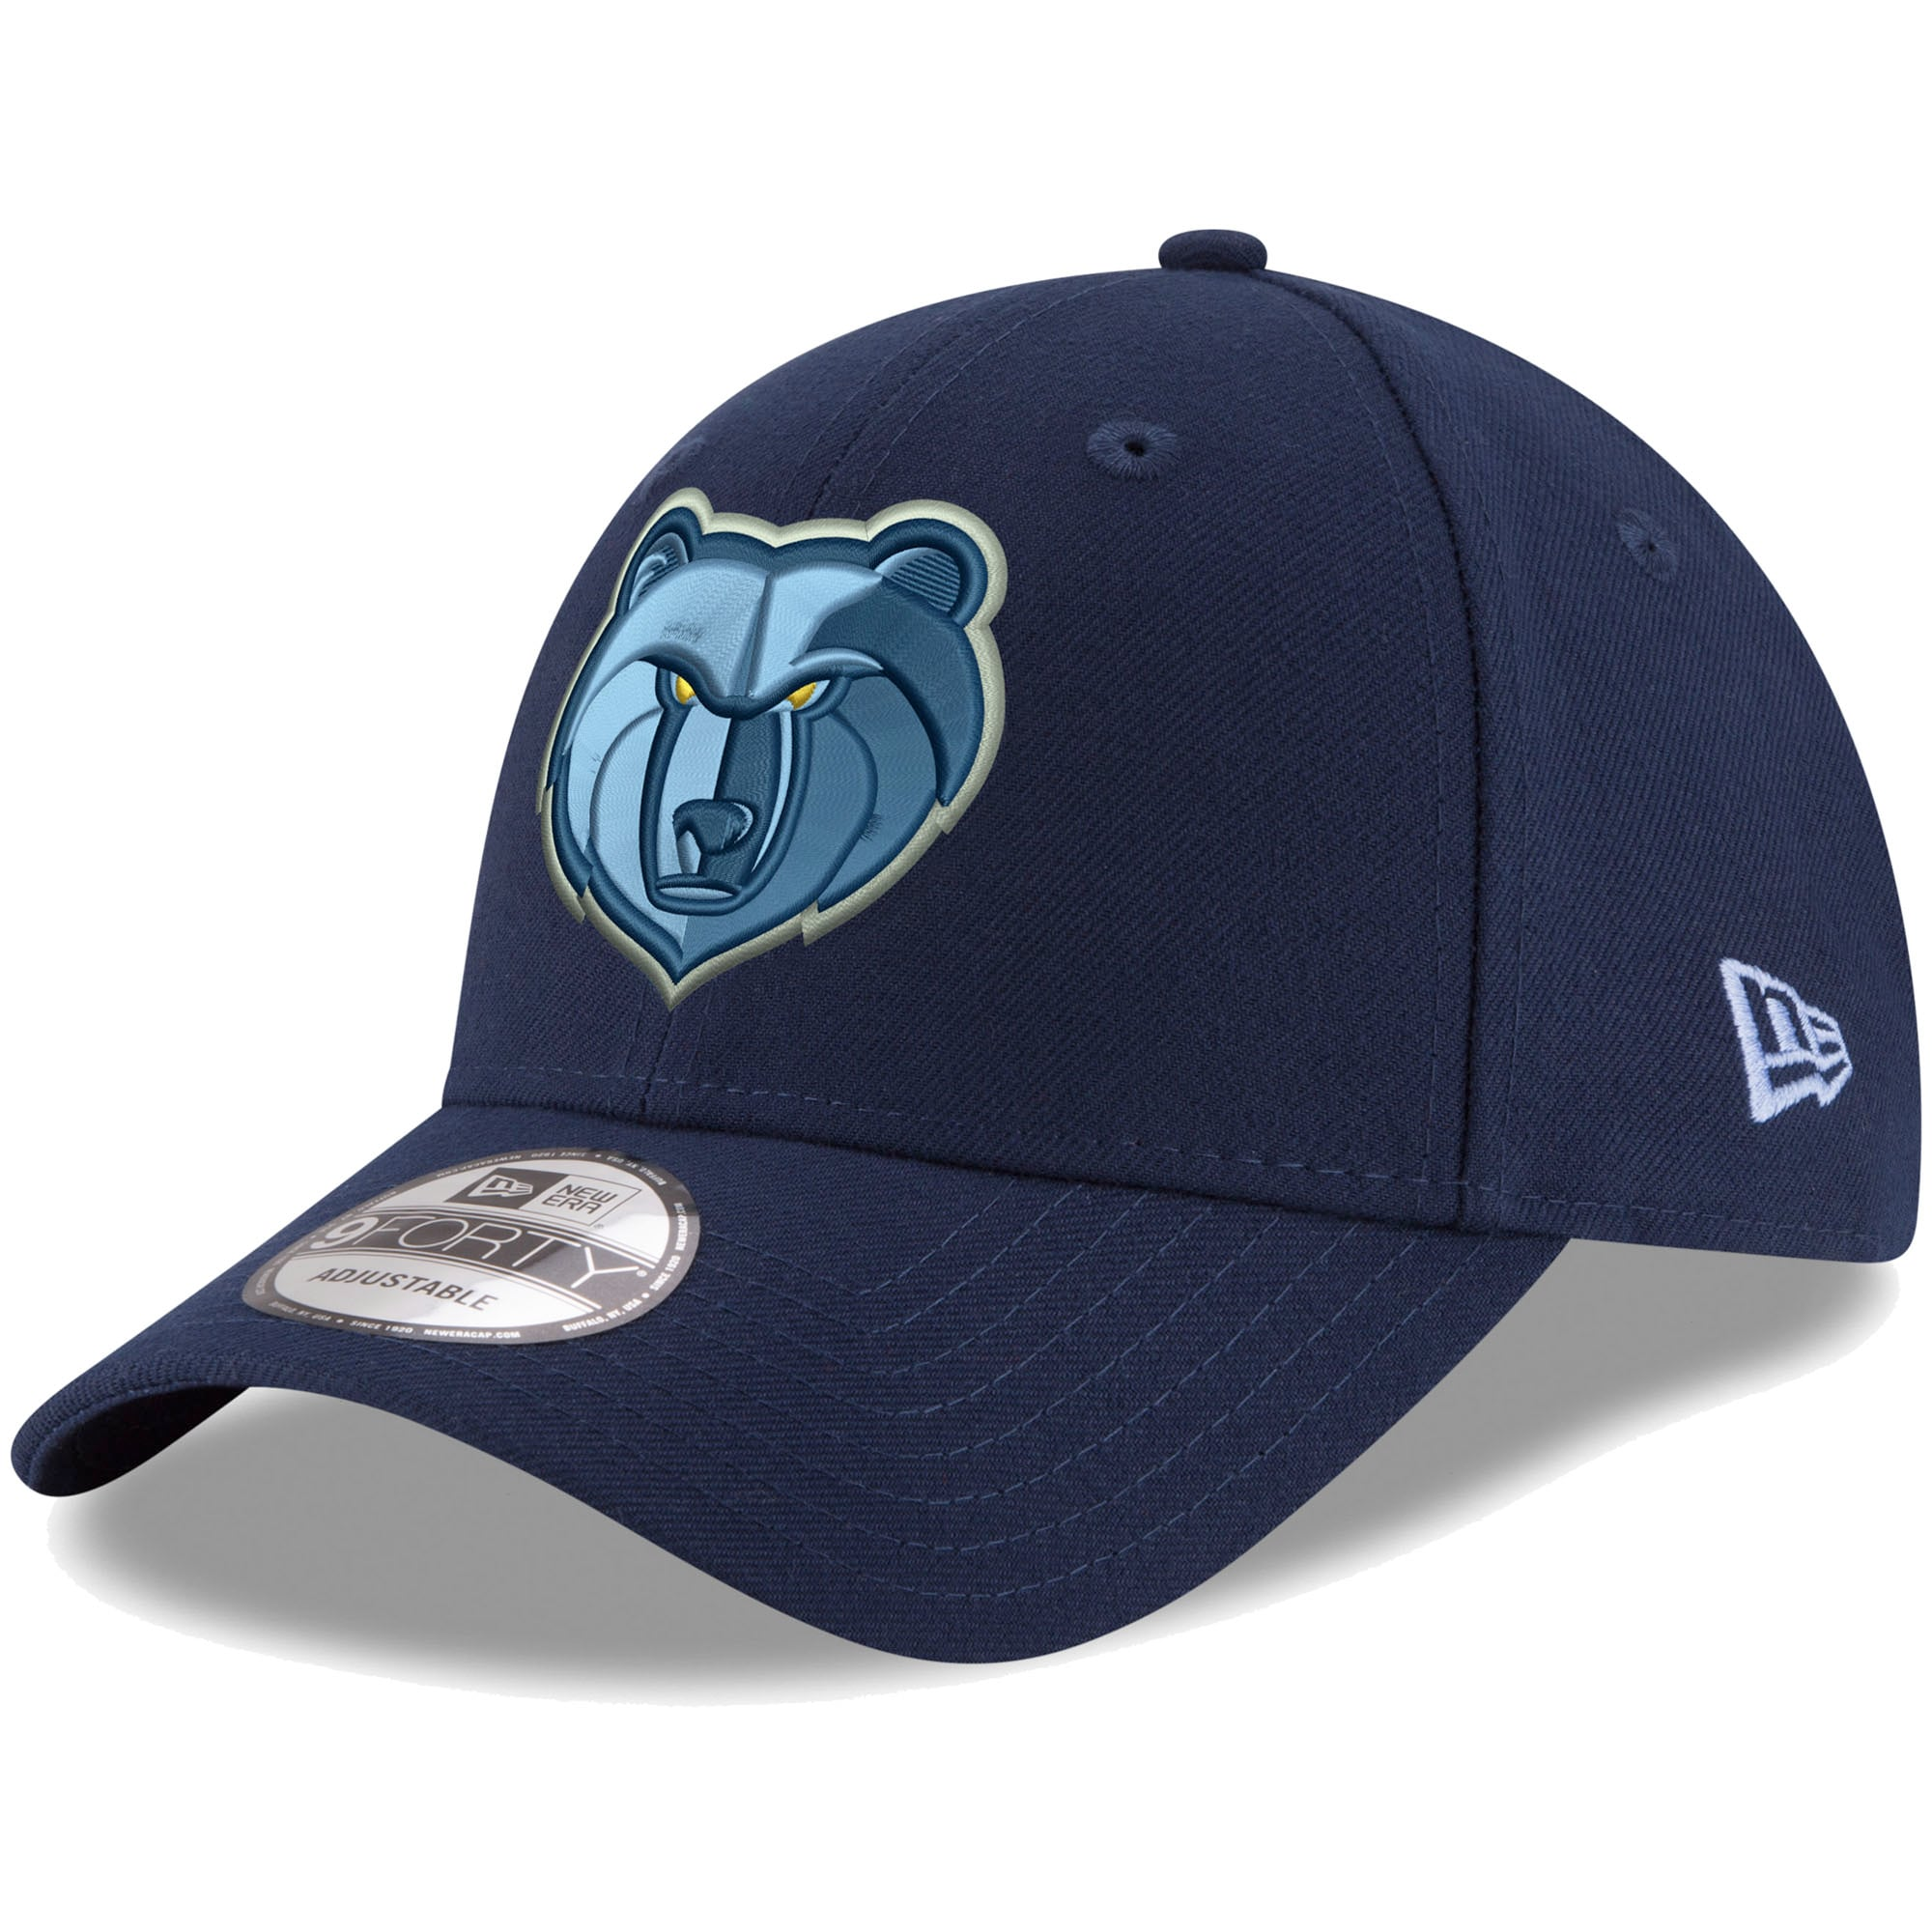 Memphis Grizzlies New Era Official Team Color The League 9FORTY Adjustable Hat - Navy